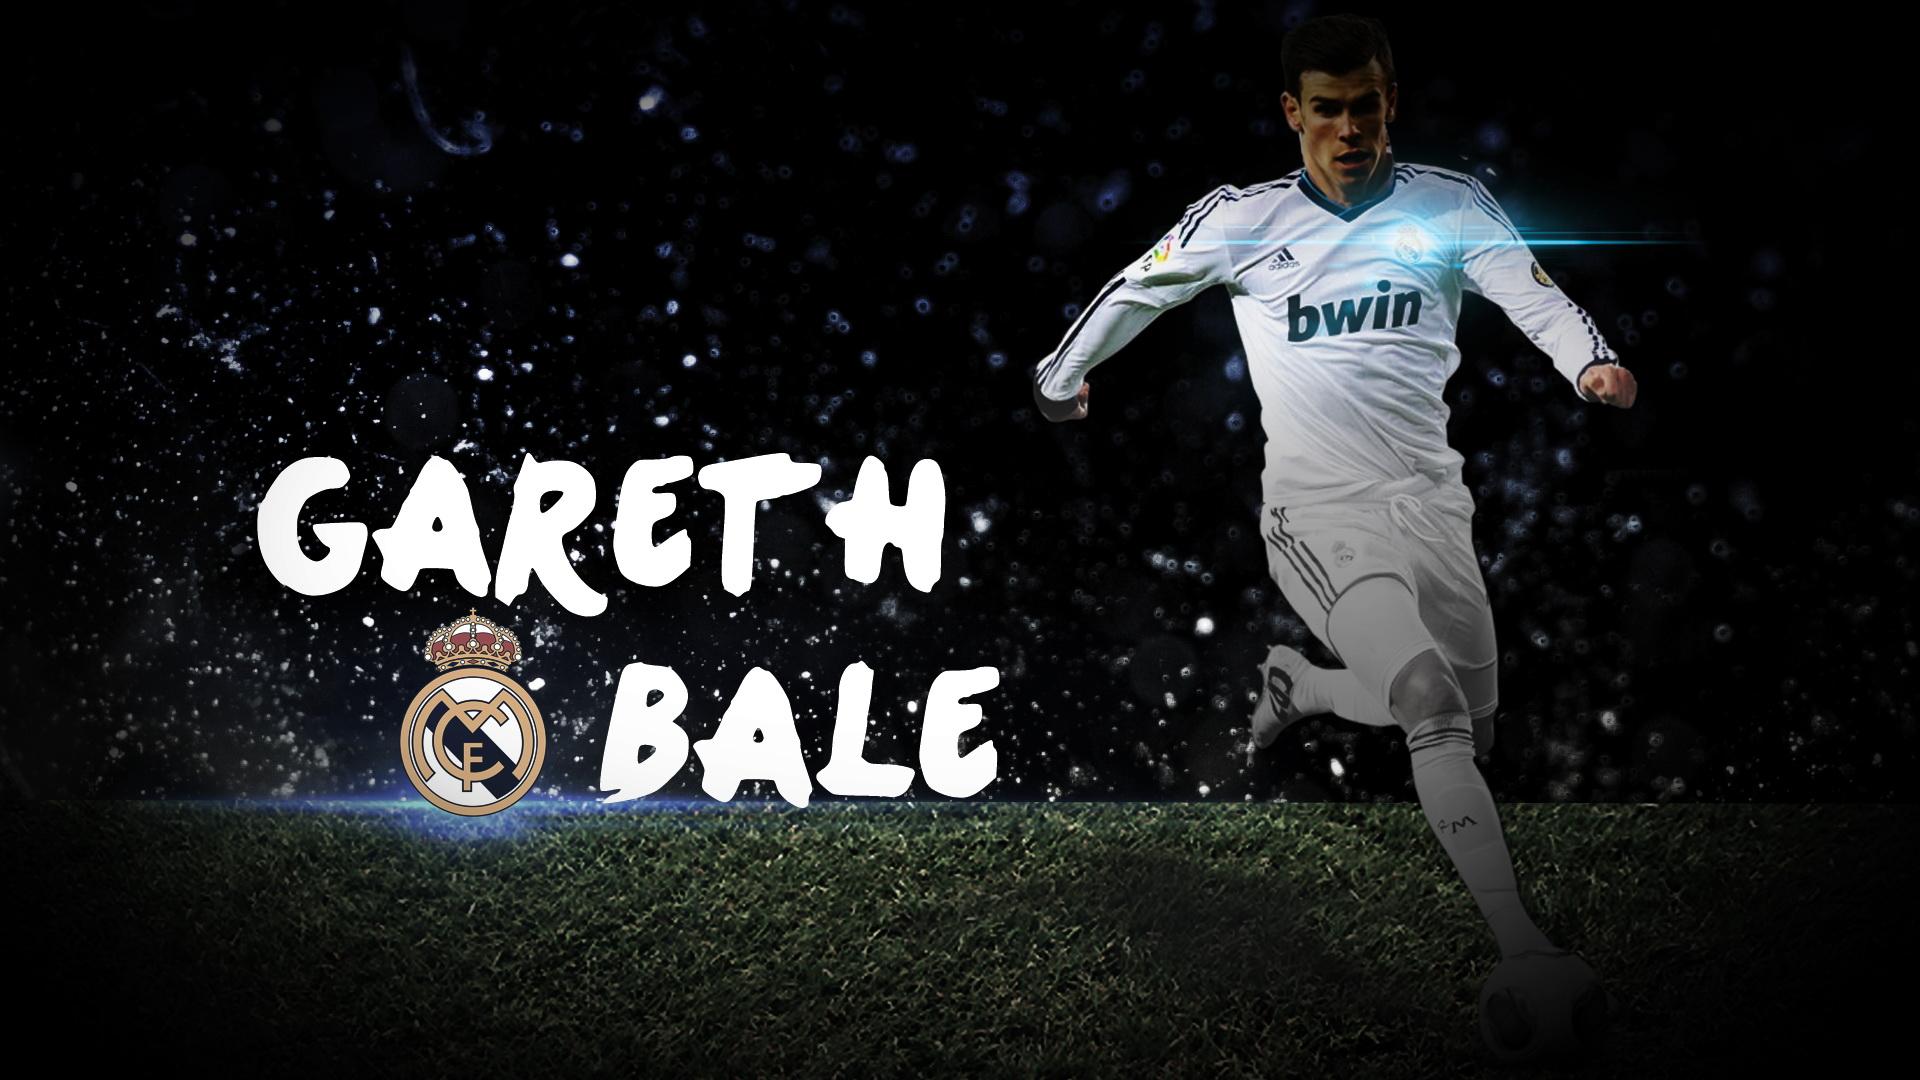 Gareth bale football wallpaper voltagebd Gallery